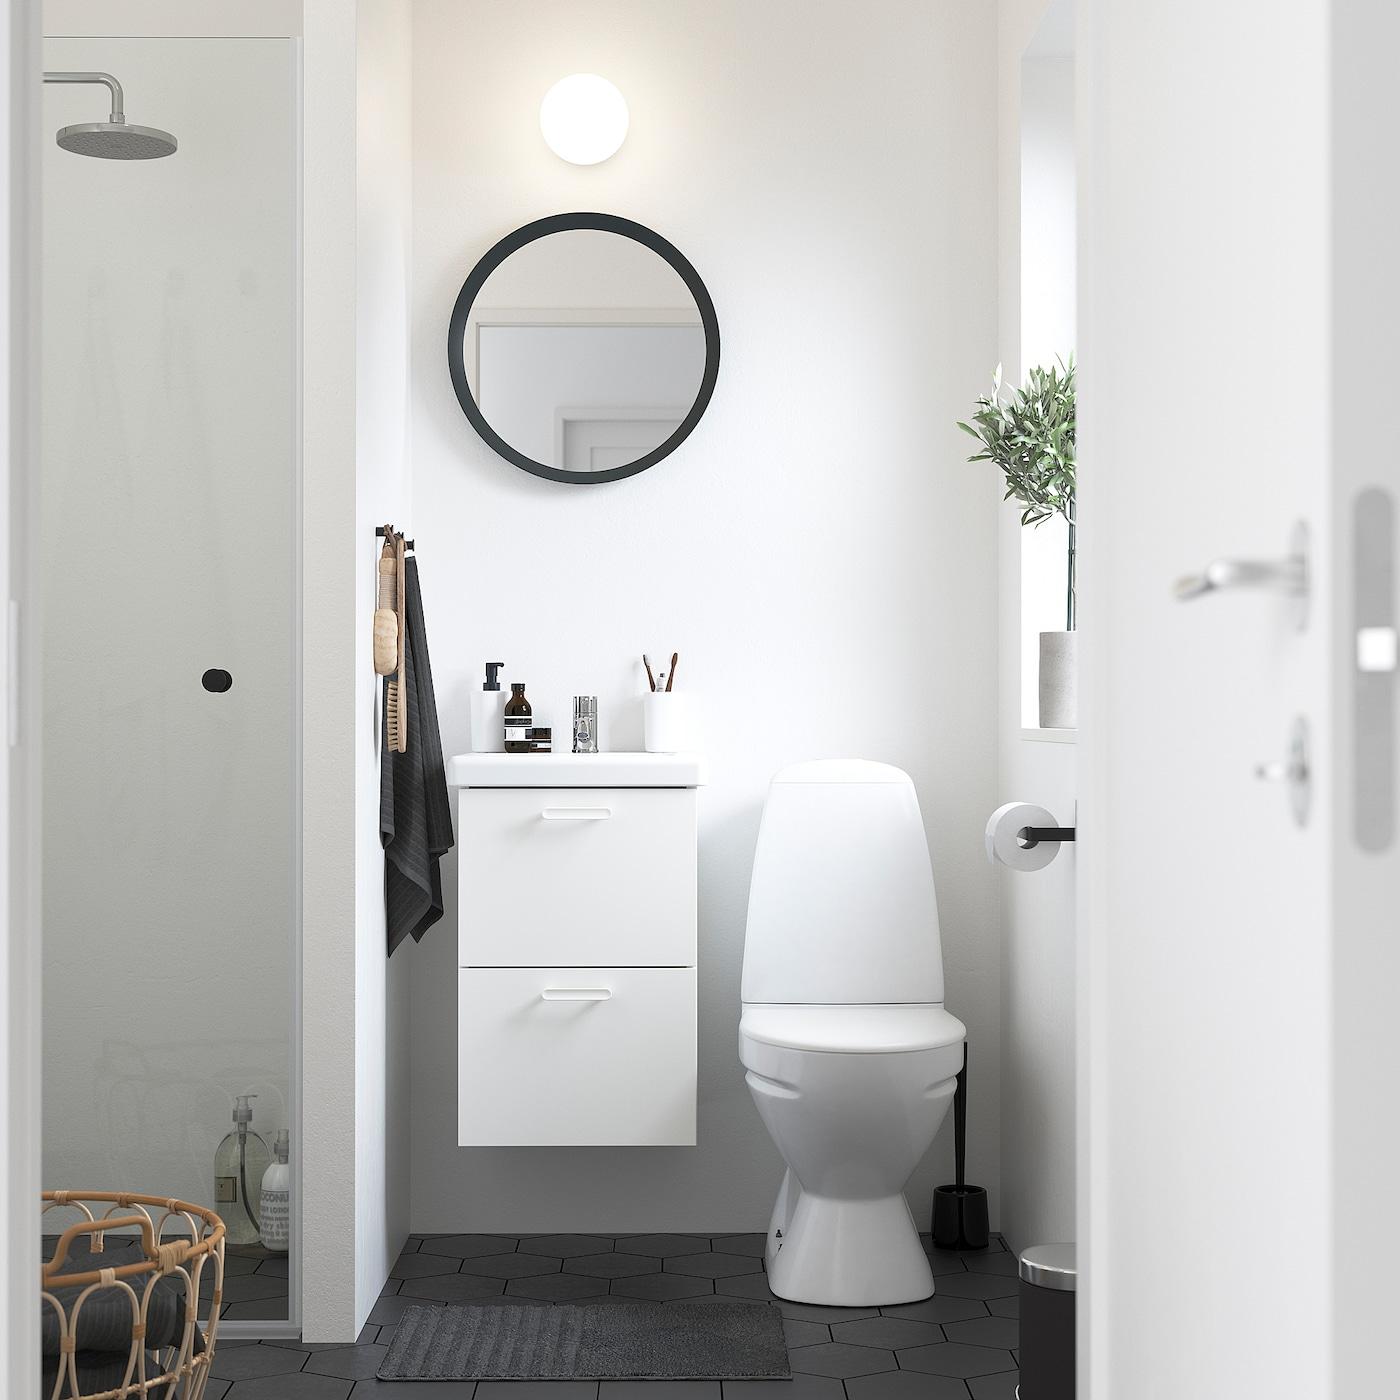 ENHET / TVÄLLEN Wash-stand with 2 drawers, white/Pilkån tap, 44x43x65 cm